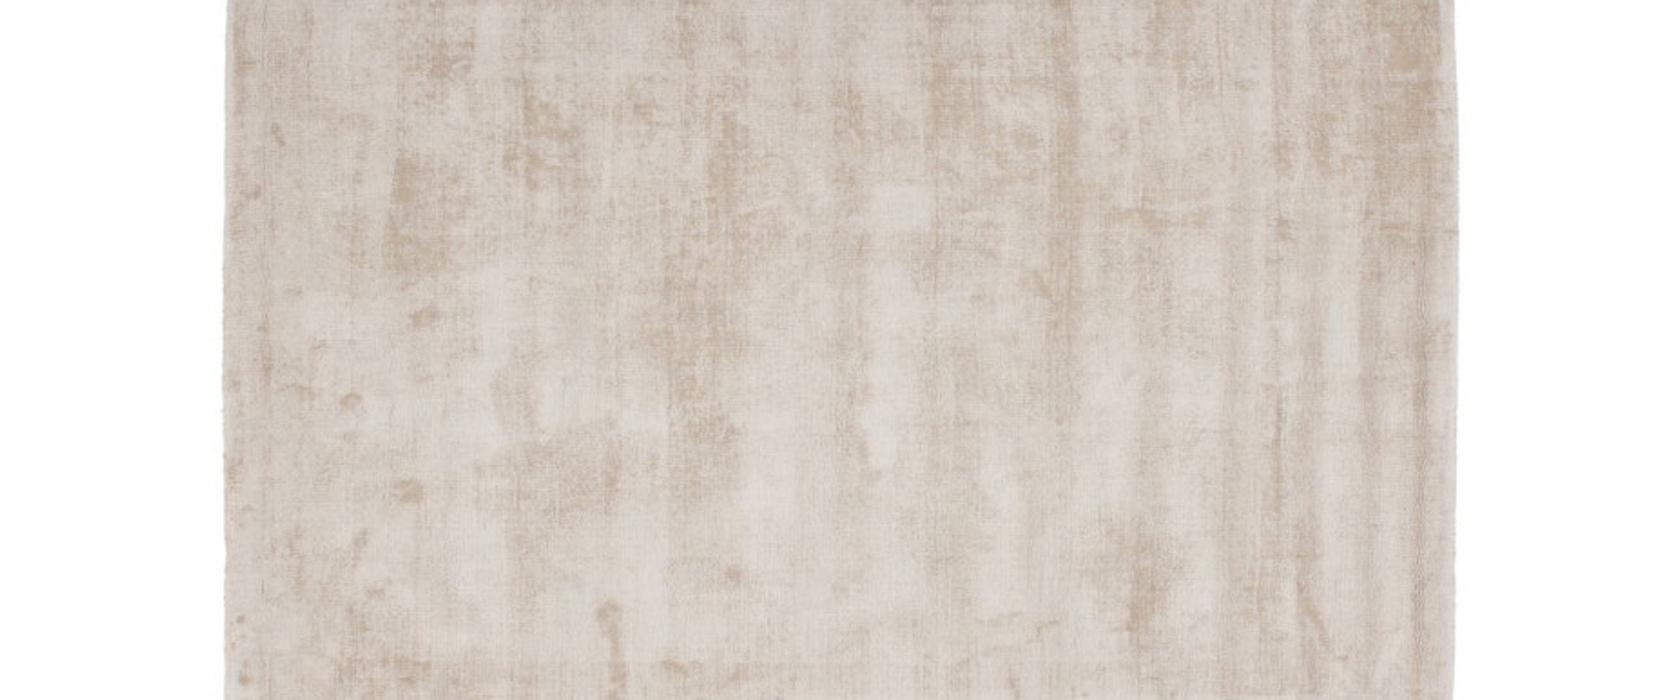 Килим My Maori 220 Ivory 160х230 см - Pufetto